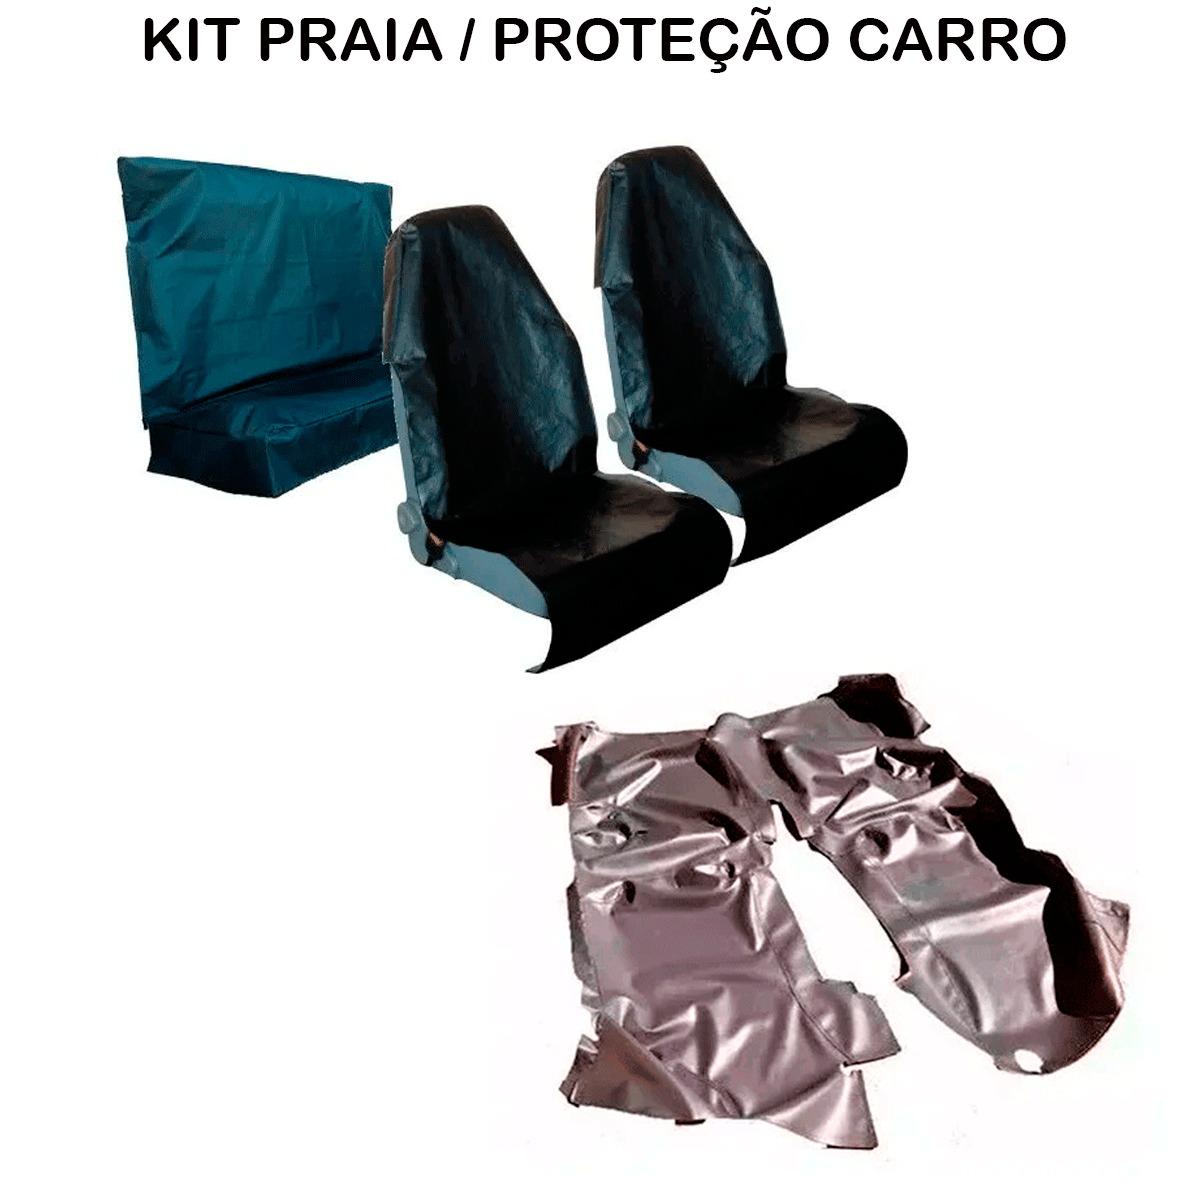 Tapete Em Vinil Volkswagen Voyage Quadrado + Capa Banco Protecao Banco Areia Suor Academia